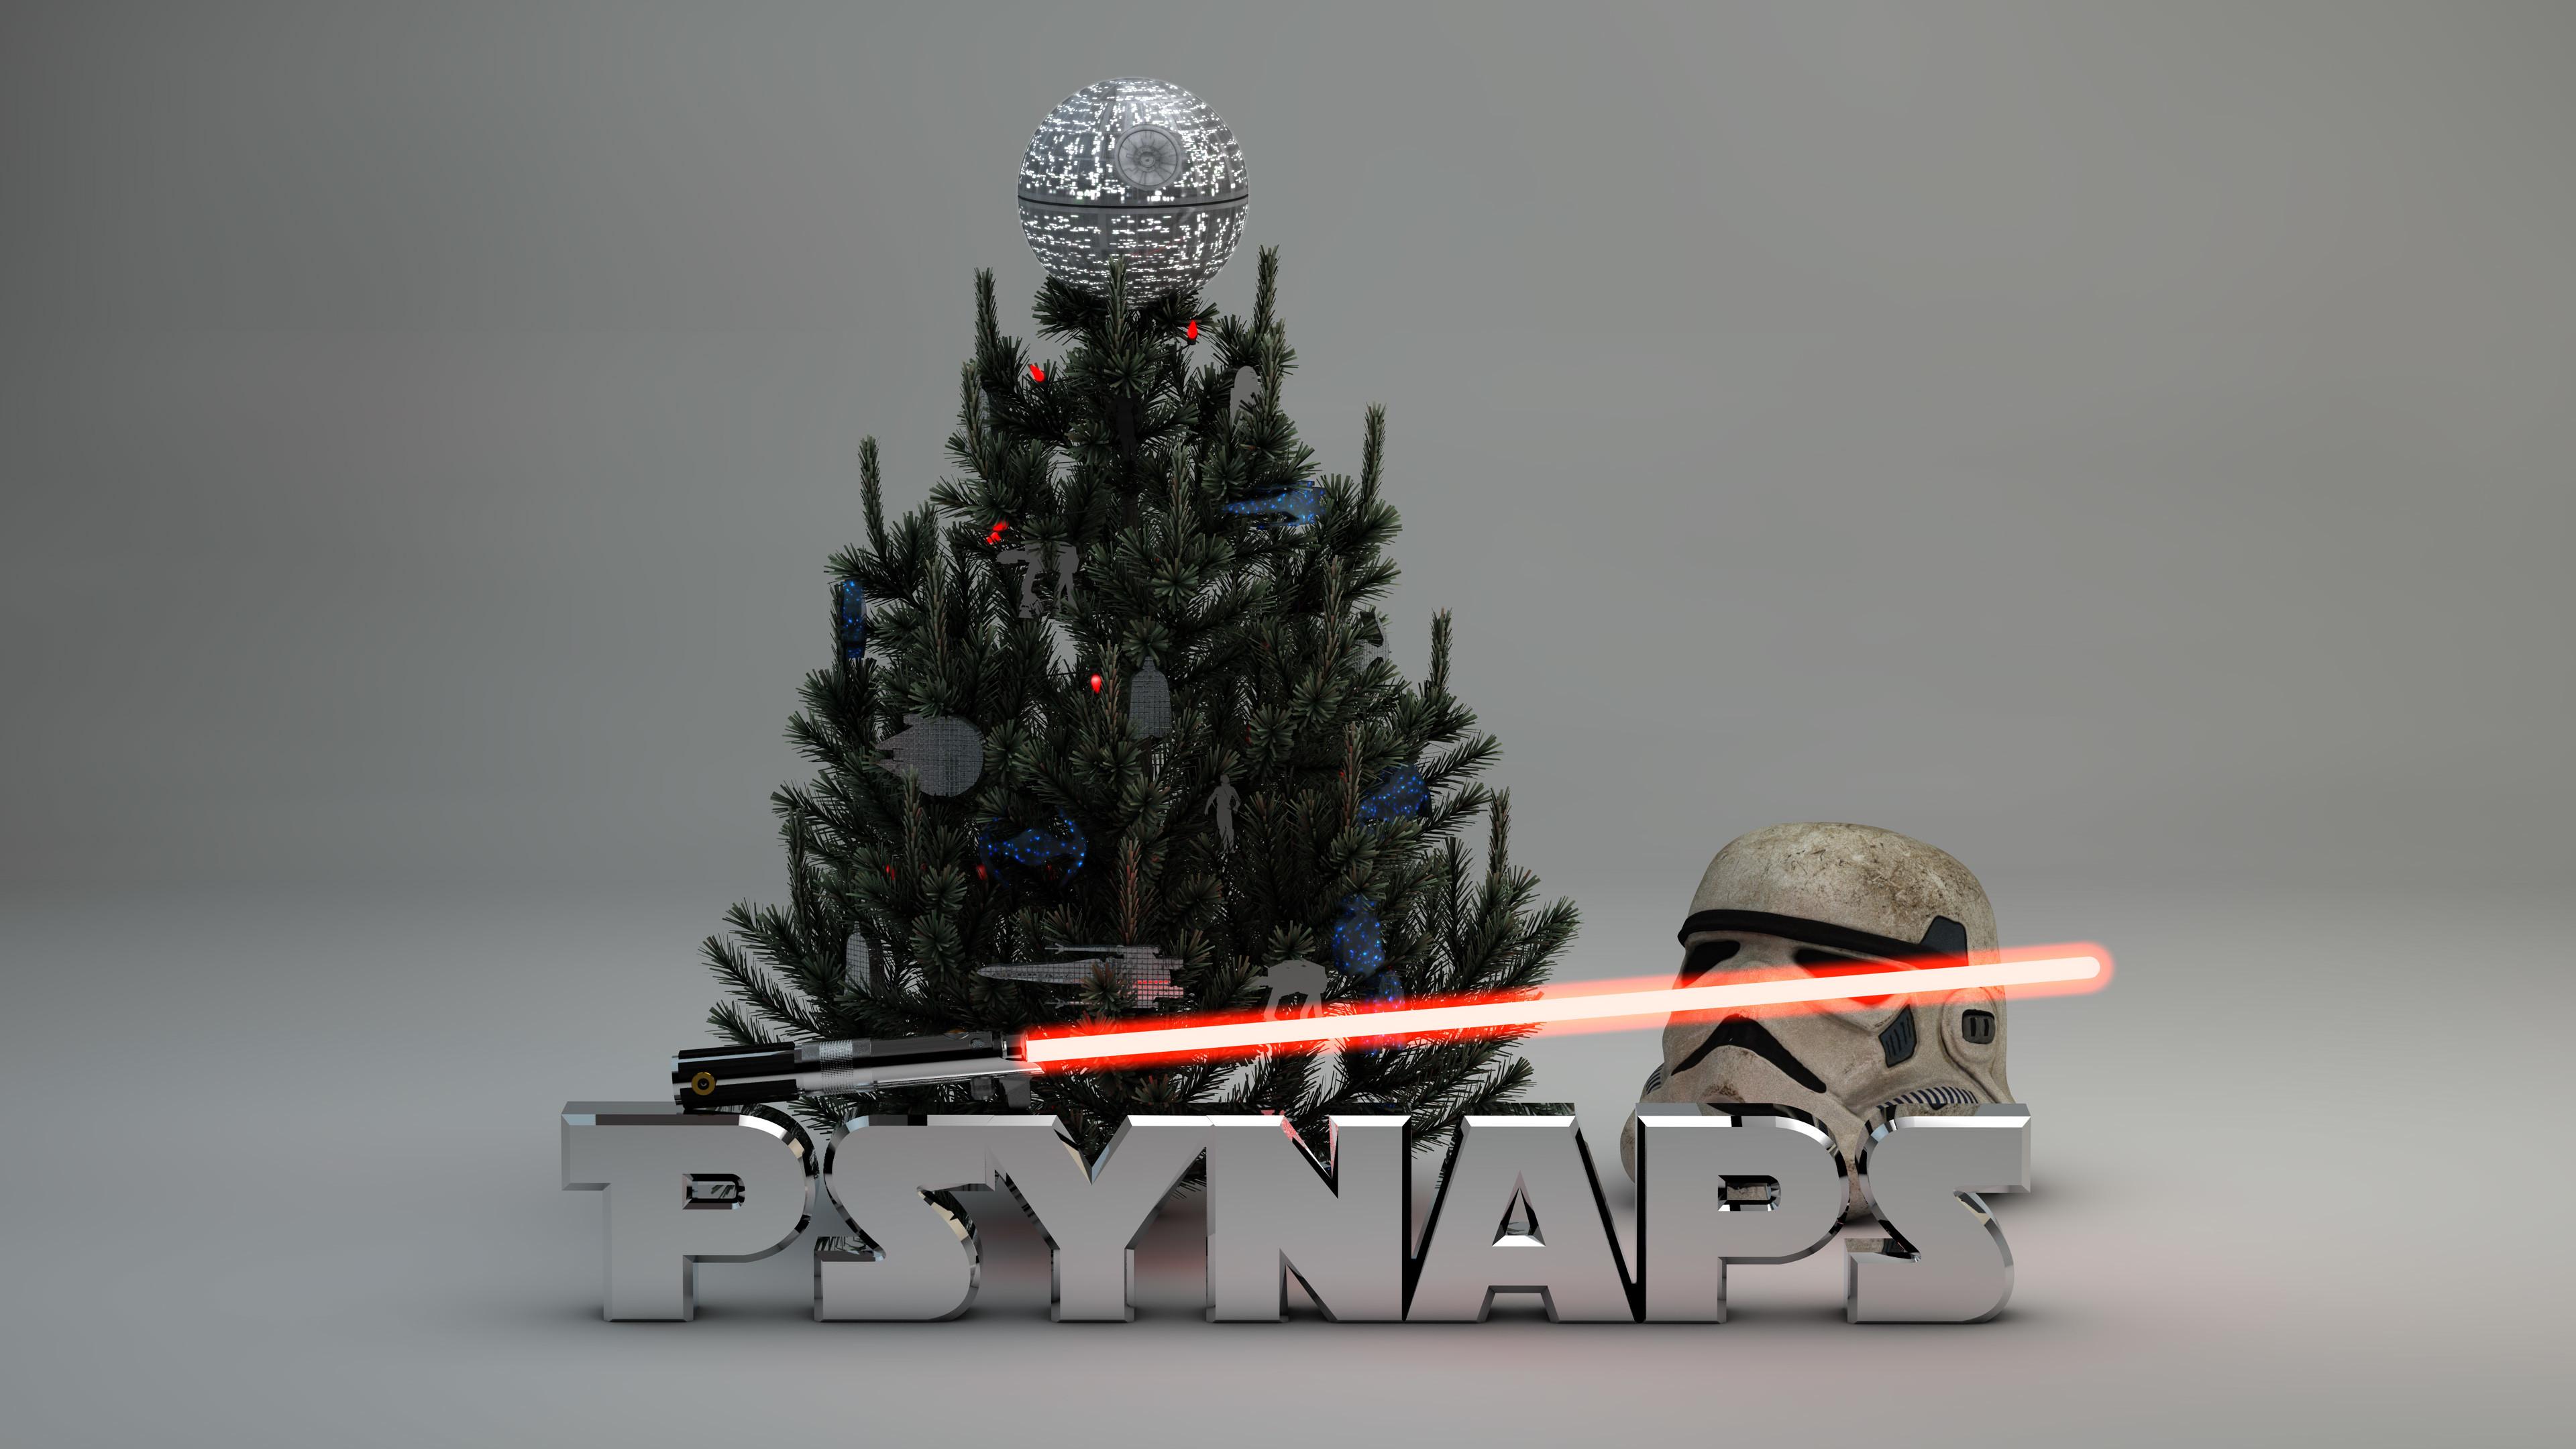 … Star Wars Christmas Tree 4K Custom Wallpaper.  Psynaps_Adobe_StarWars_Theme_Tree_Psynaps0006